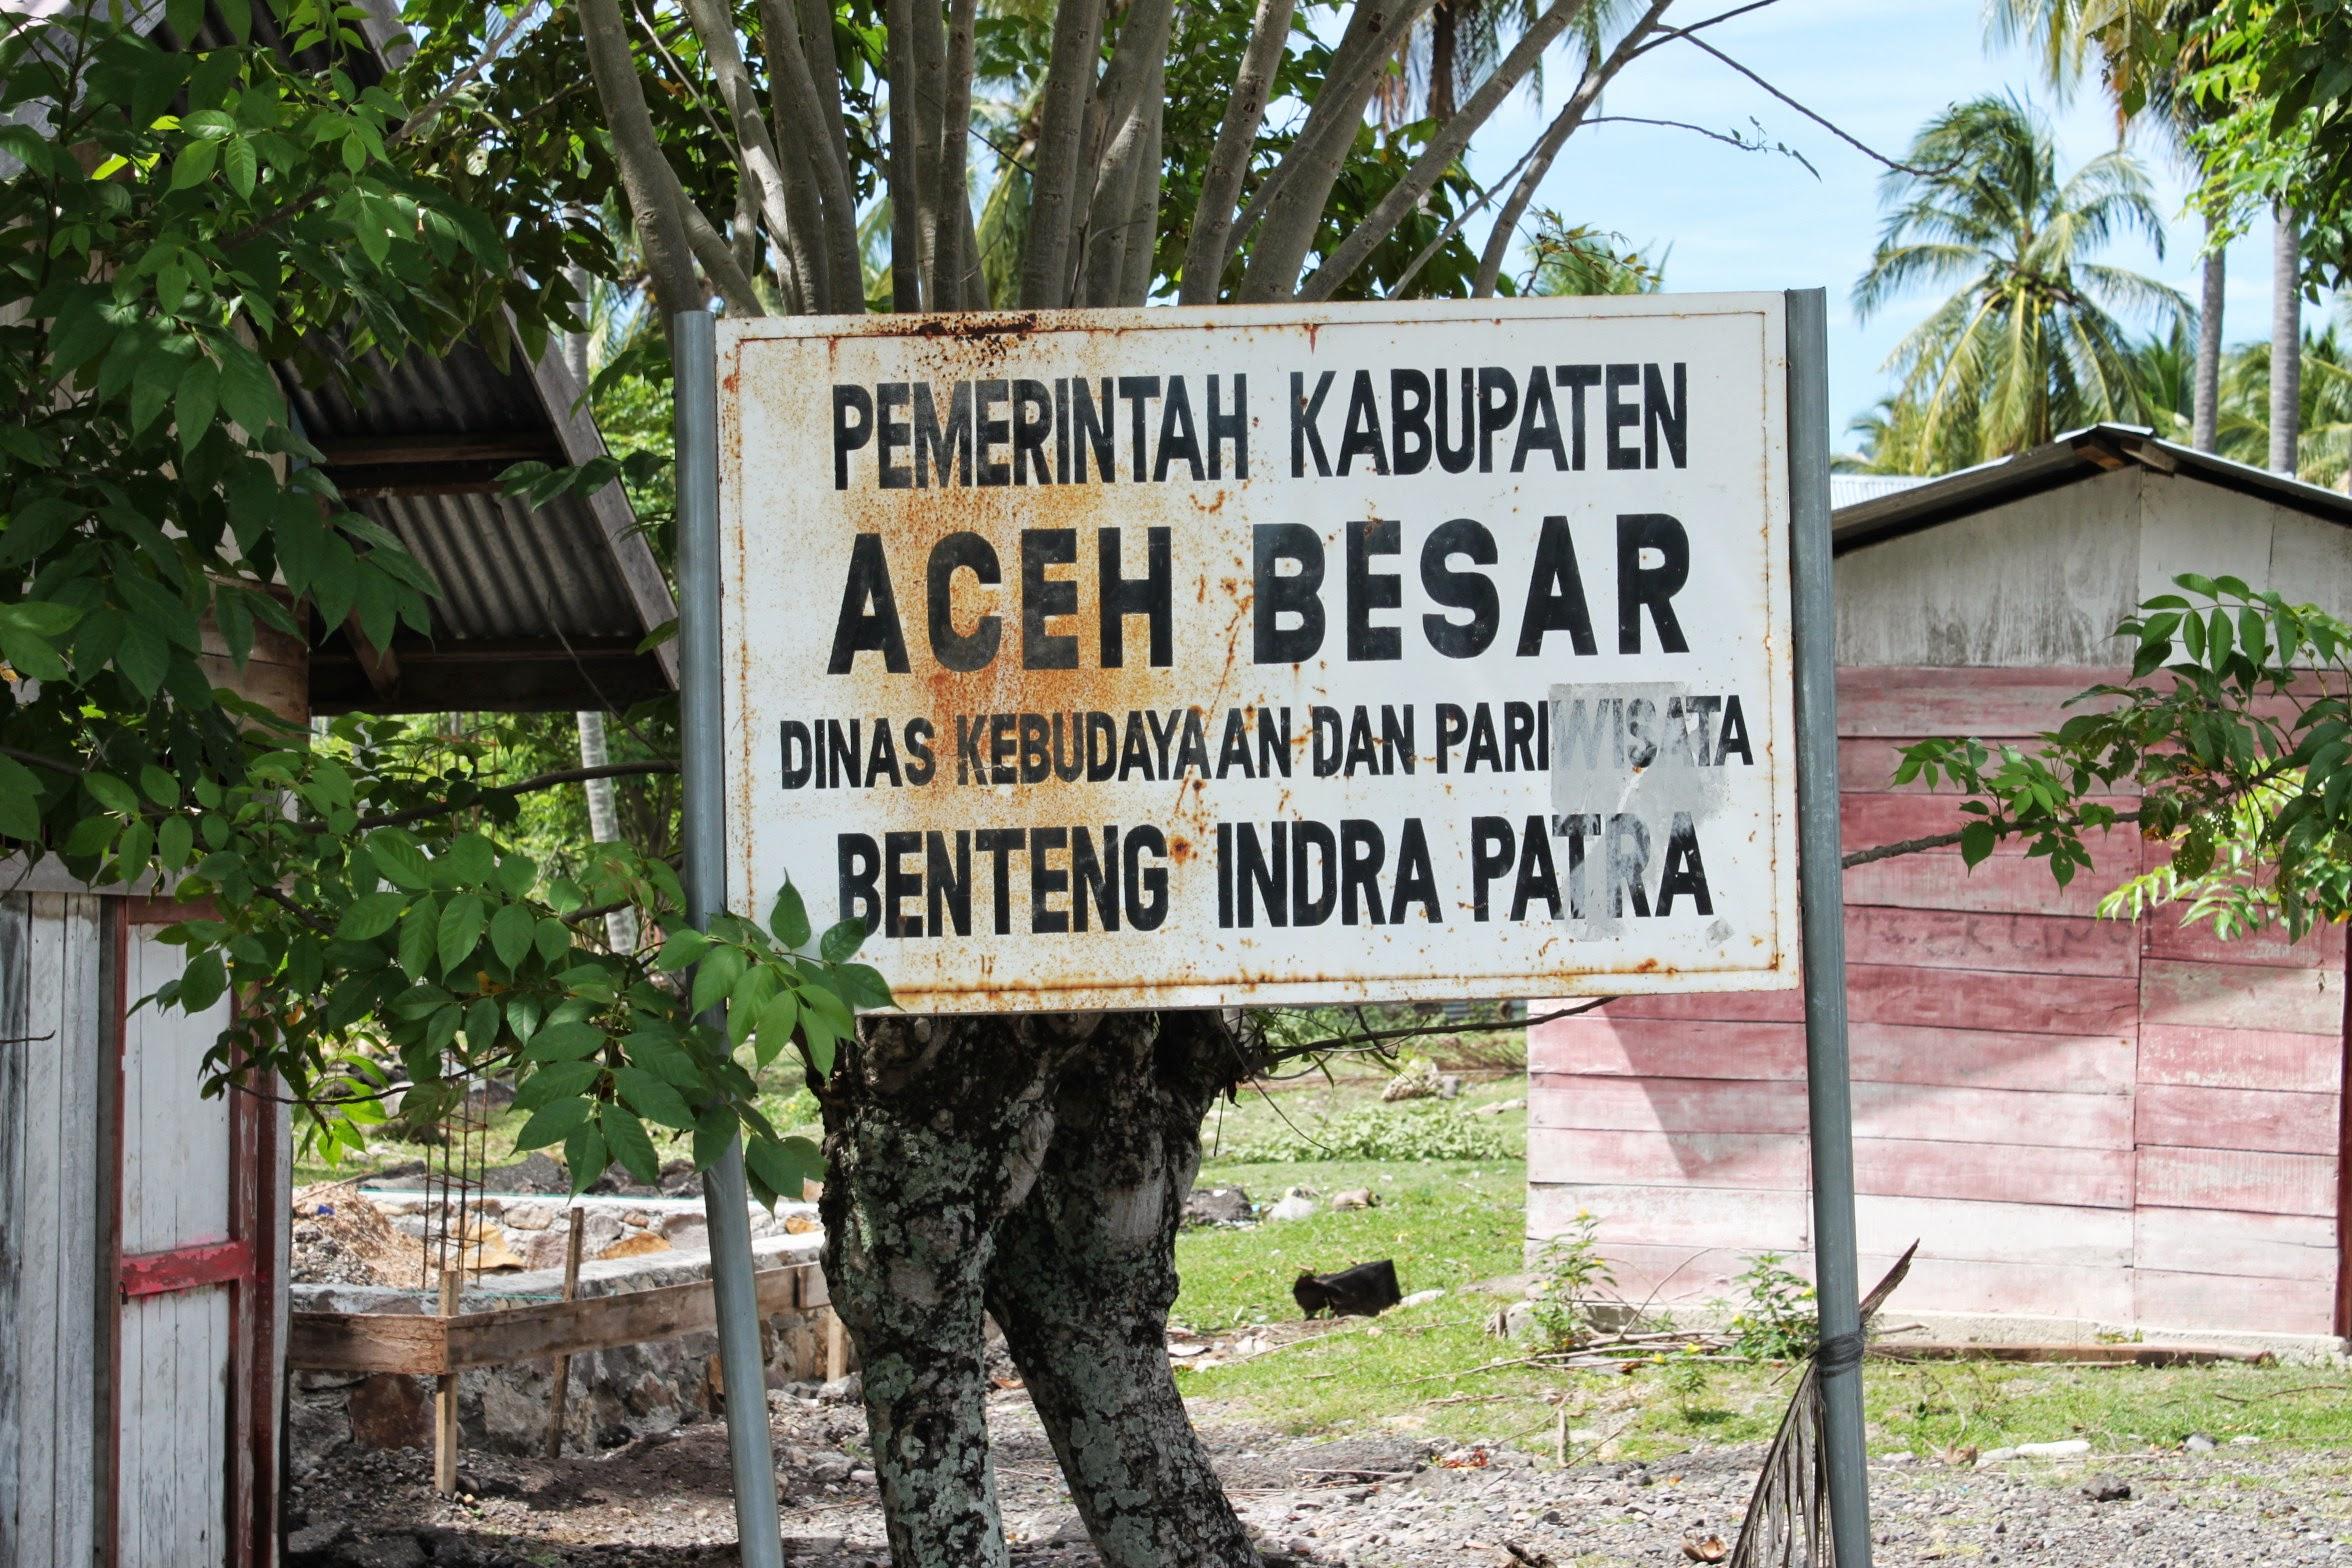 Benteng Indrapatra Saksi Kemunculan Islam Aceh Kota Banda